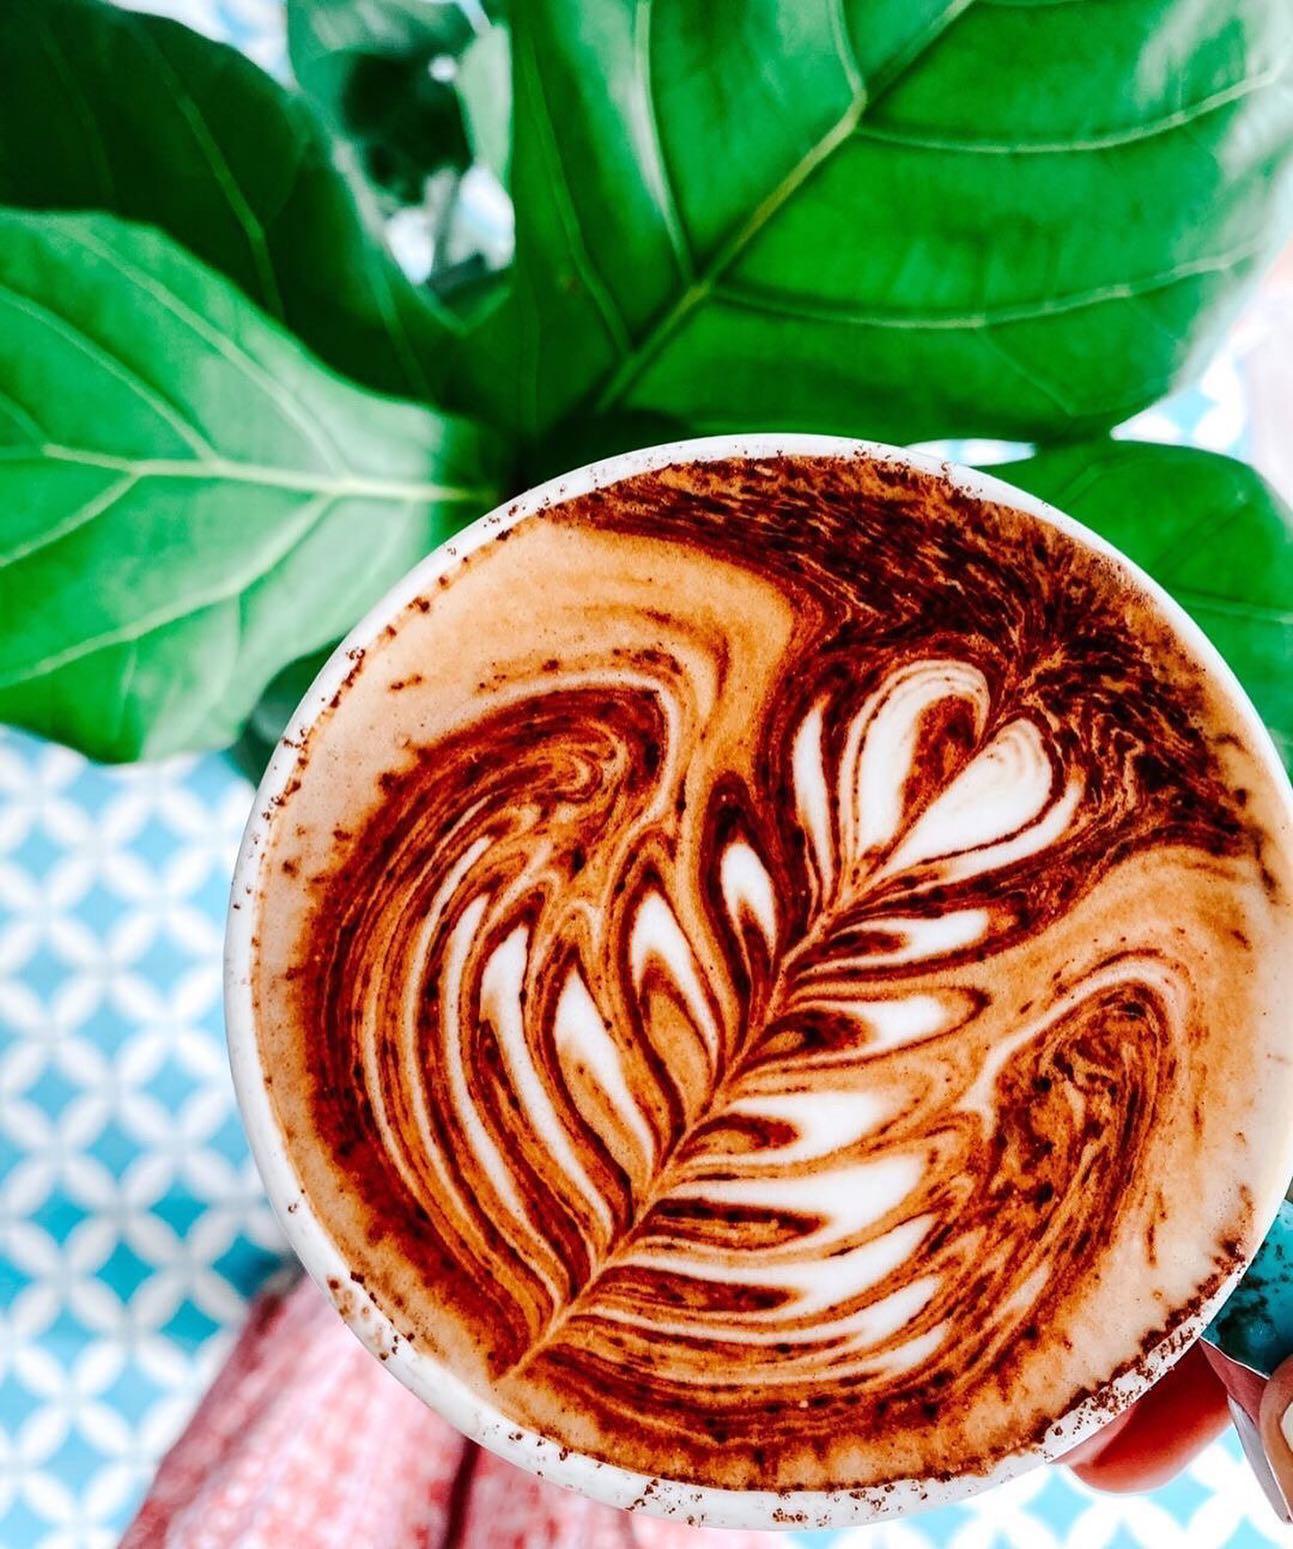 Sparrow Coffee Co